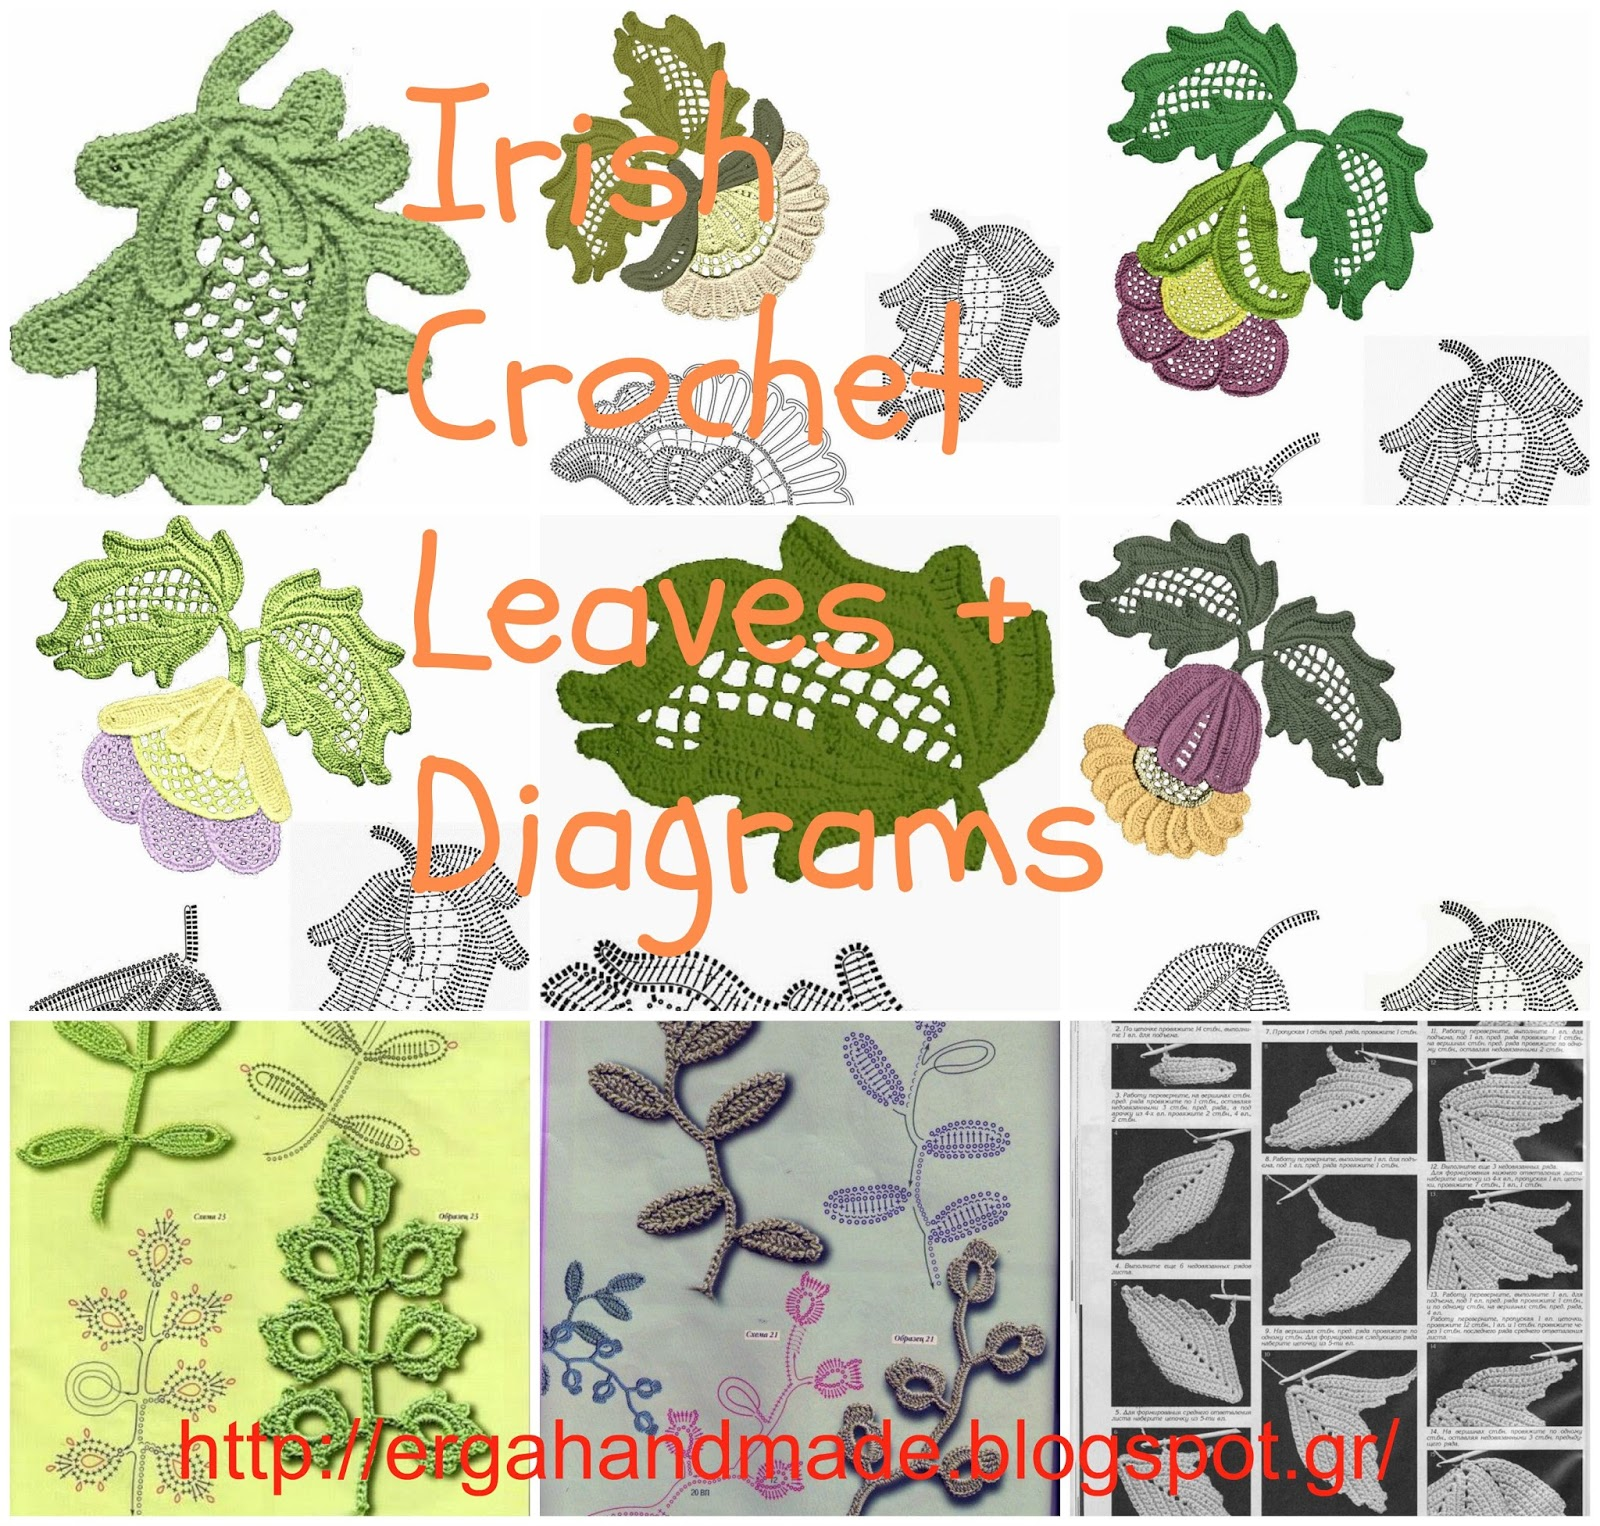 Ergahandmade irish crochet leaves diagrams irish crochet leaves diagrams ccuart Images